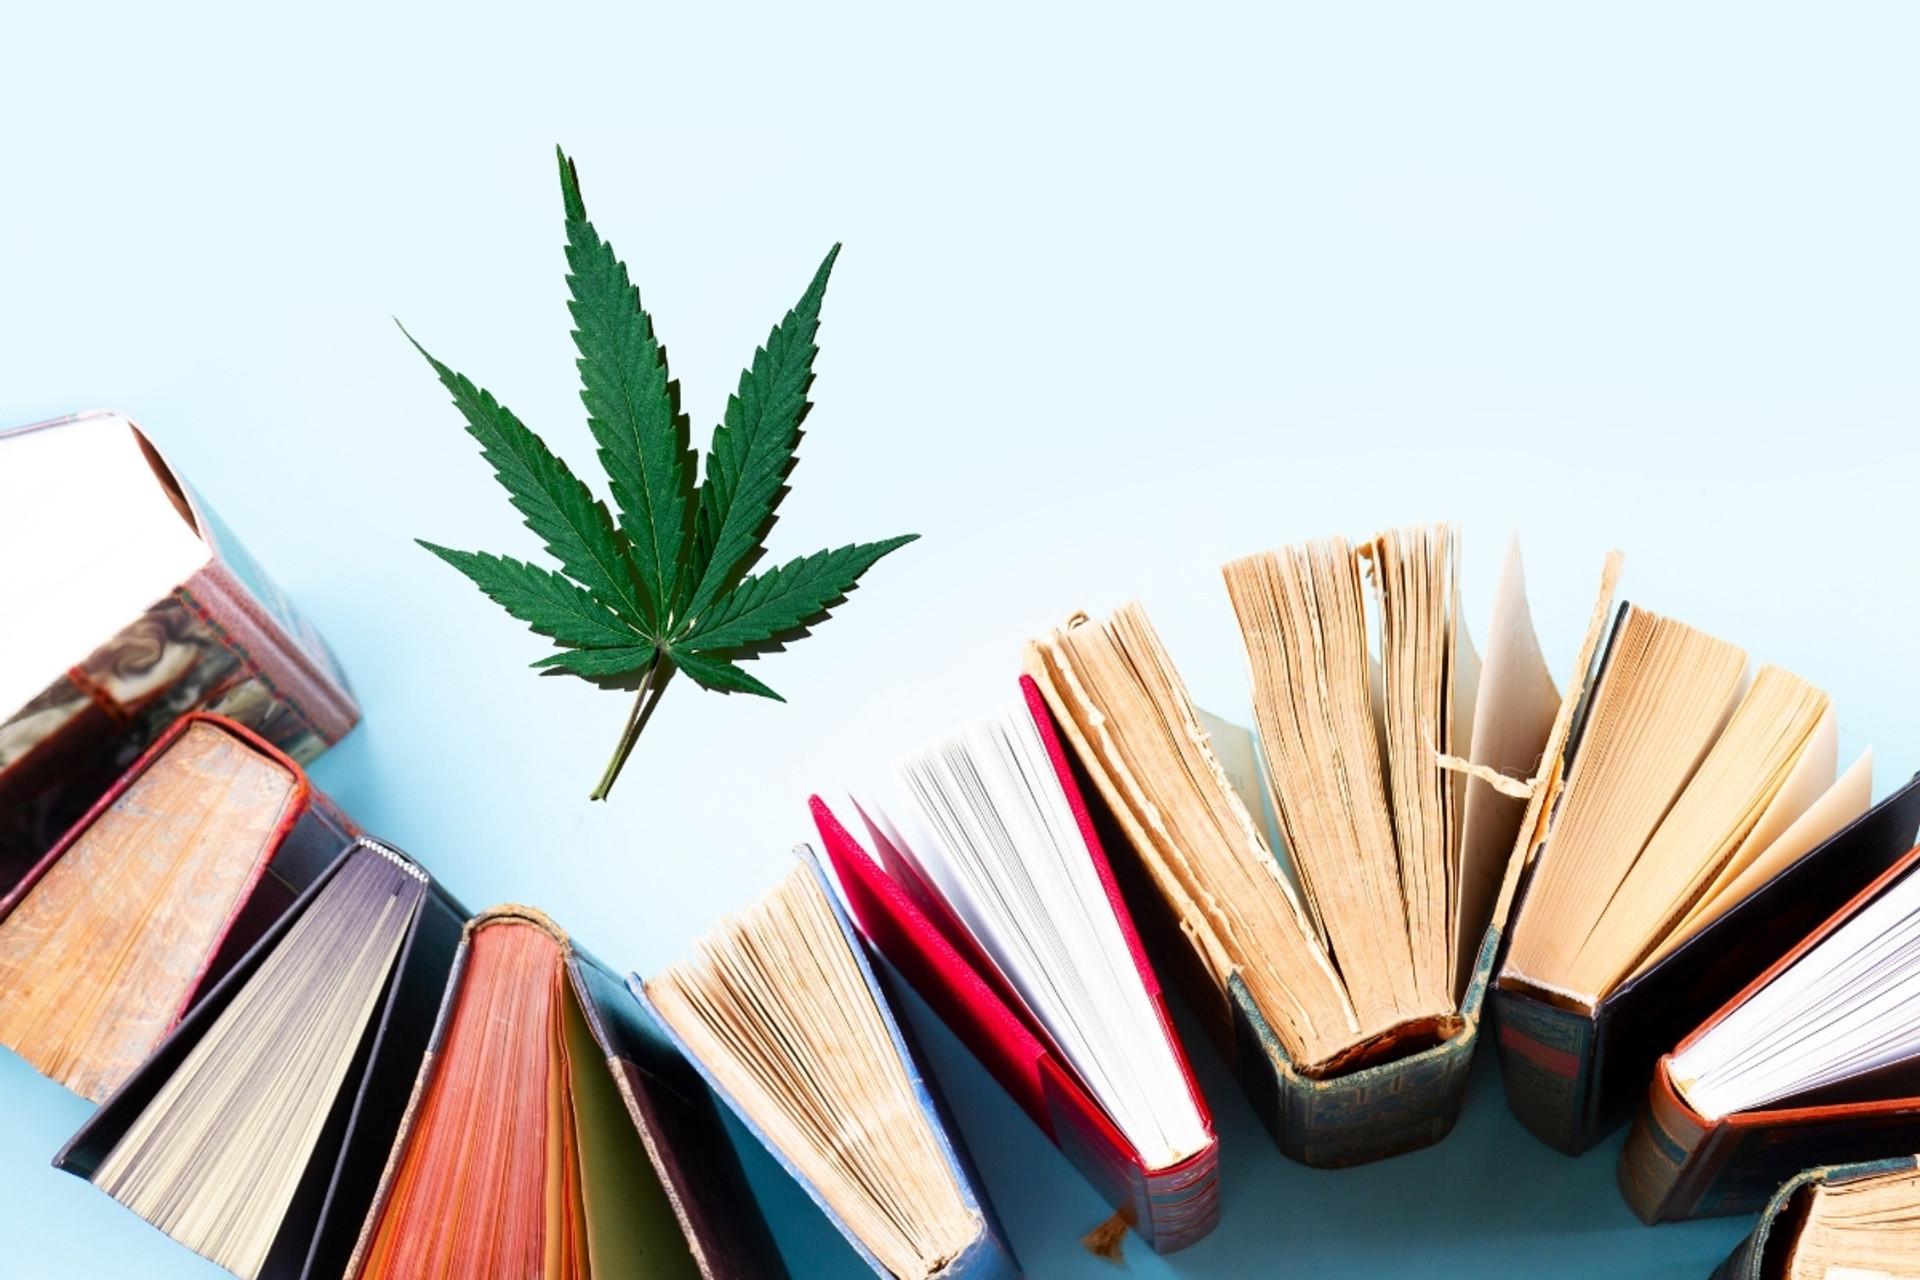 Our 6 Favorite Books on CBD